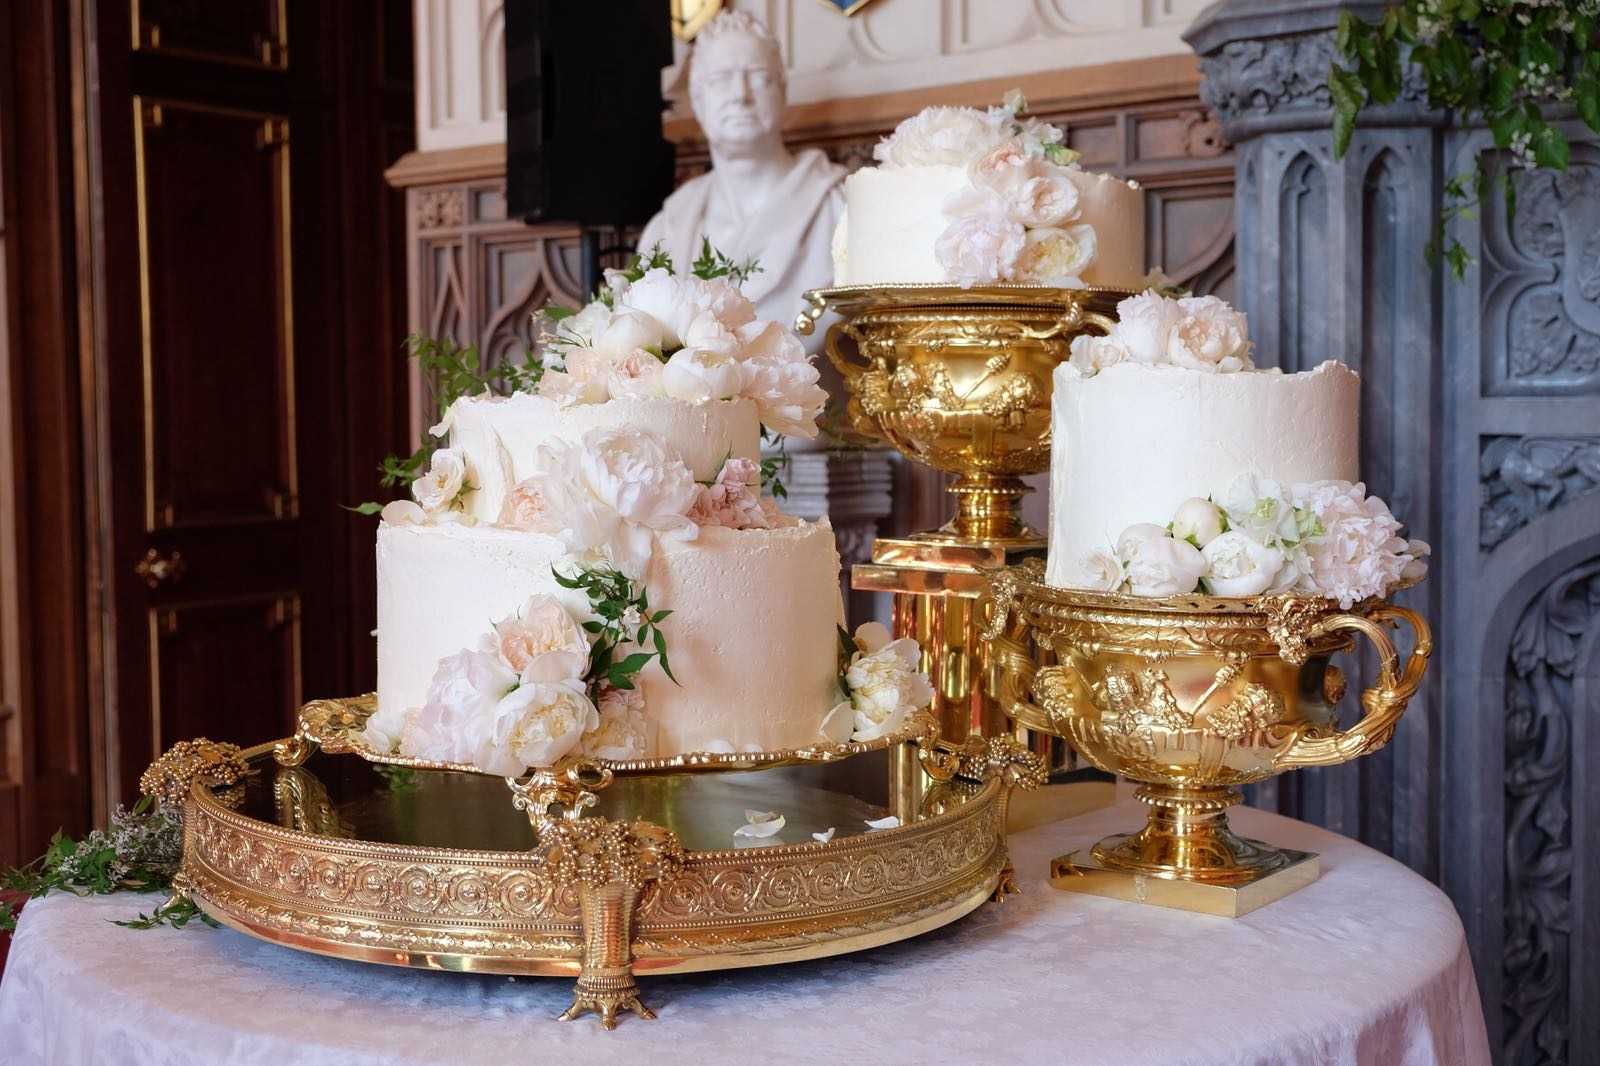 Photo: Kensington Palace